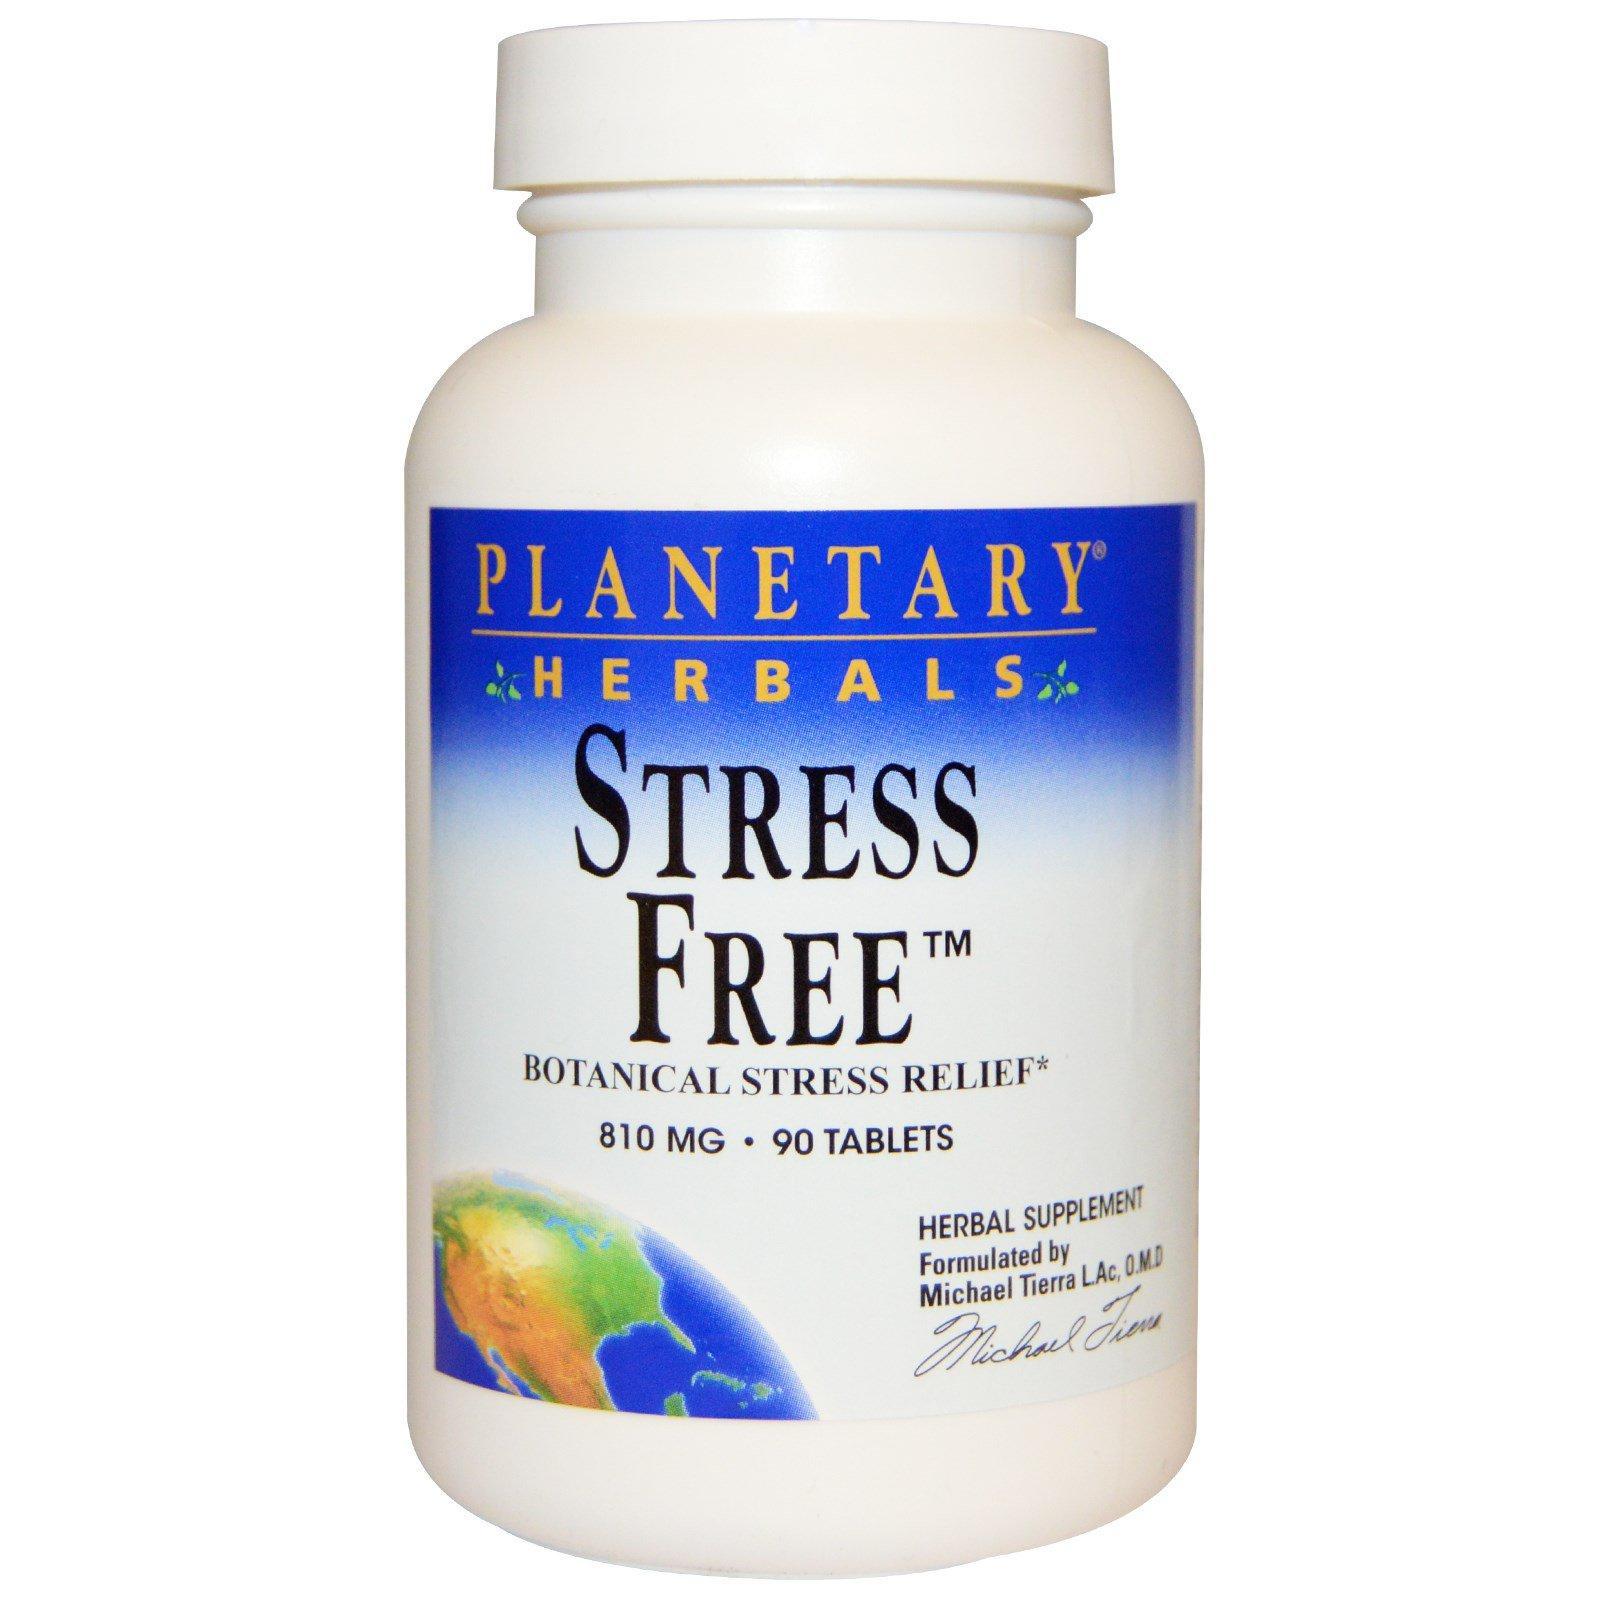 Planetary Herbals القضاء على التوتر أعشاب لعلاج التوتر 810 ملغم 90 حبة Iherb